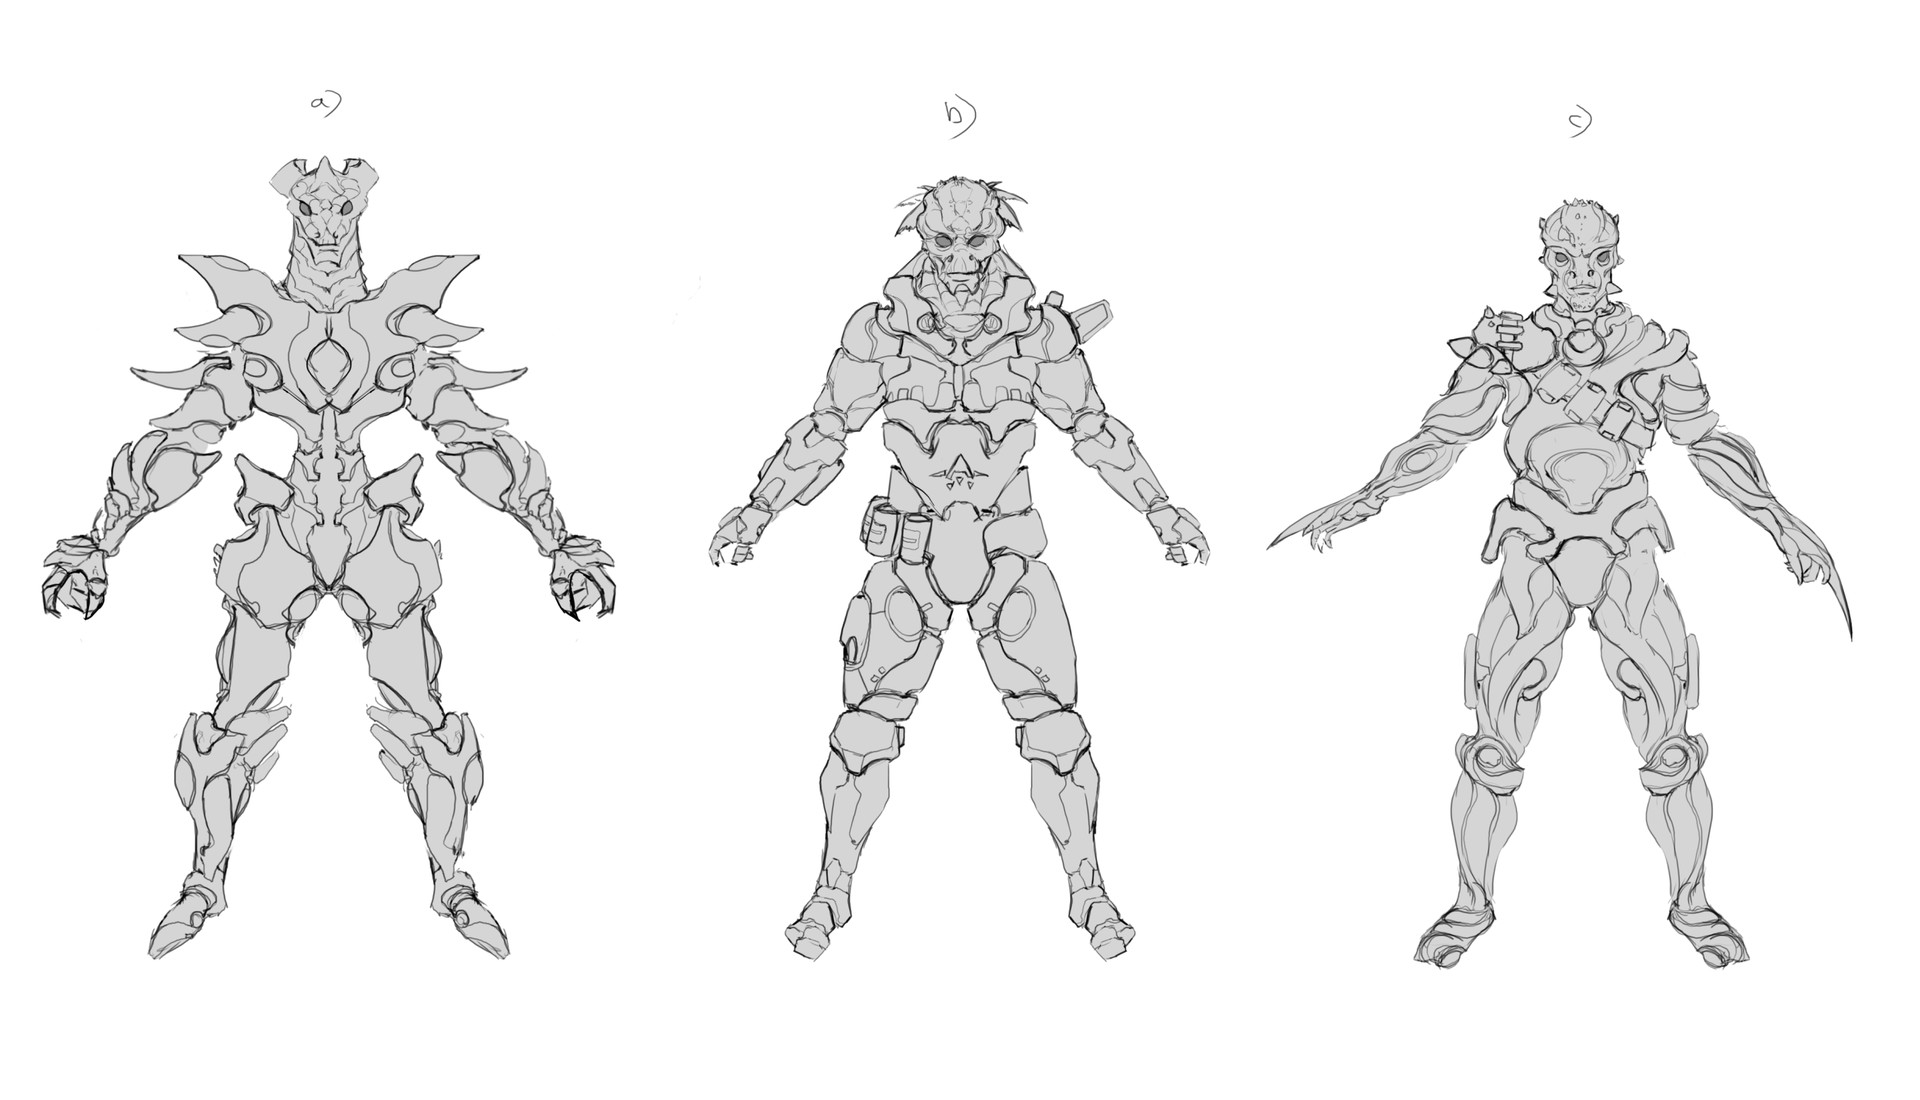 Danny kundzinsh vrinn mongol character concept art early sketches